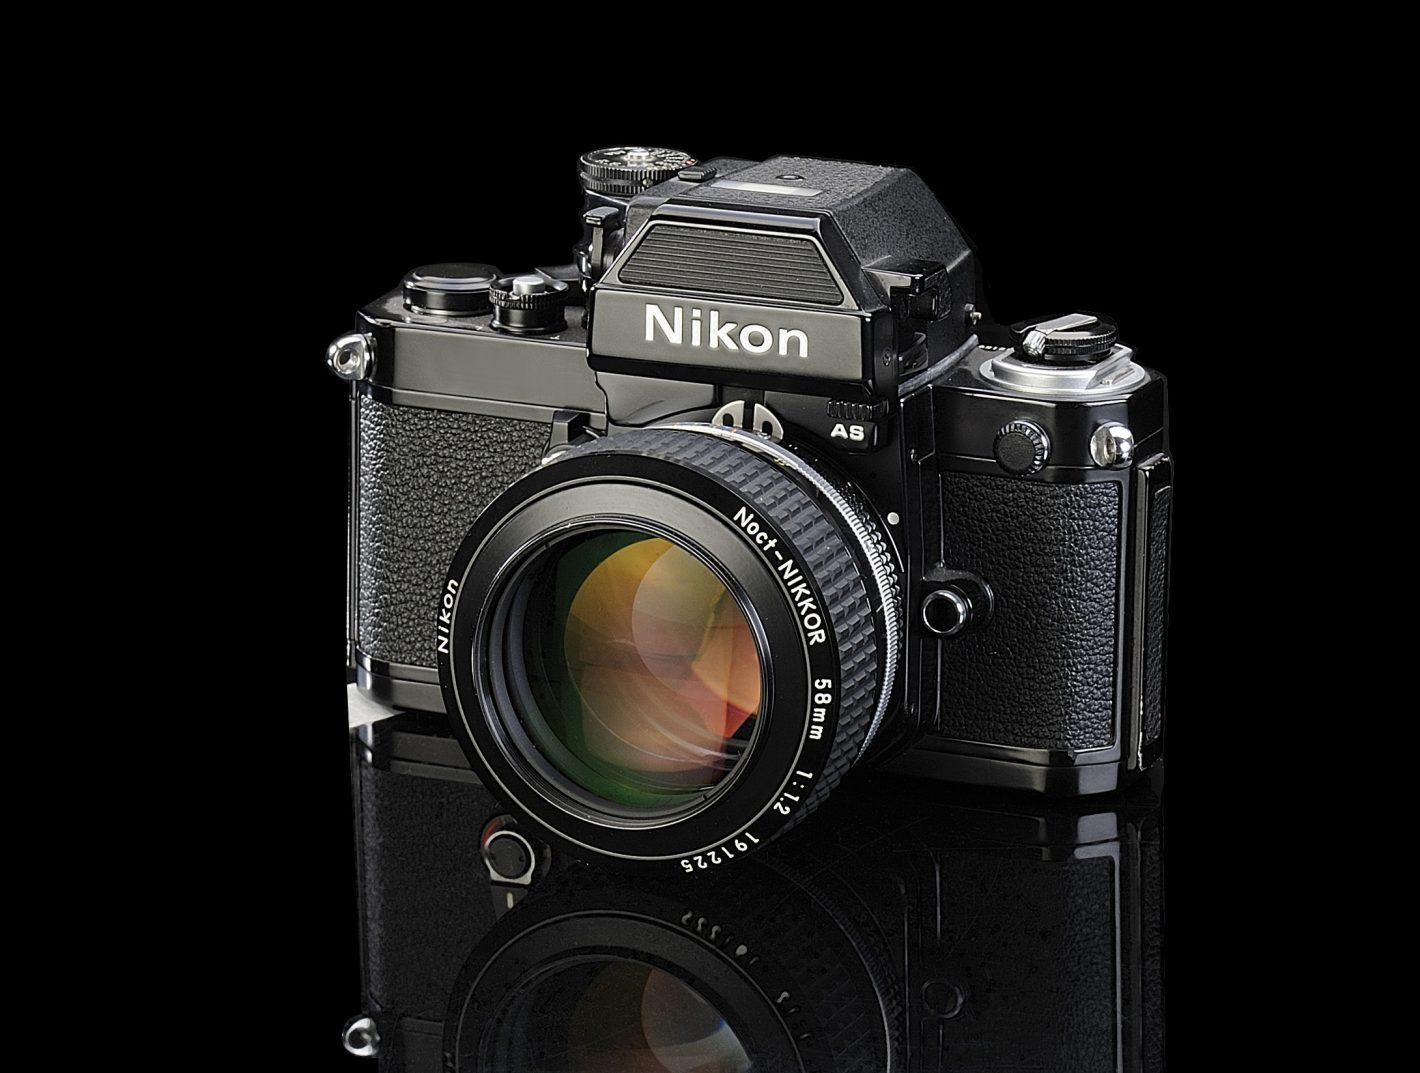 Collectionneur Thierry Ravassod Nikon Noct Nikkor